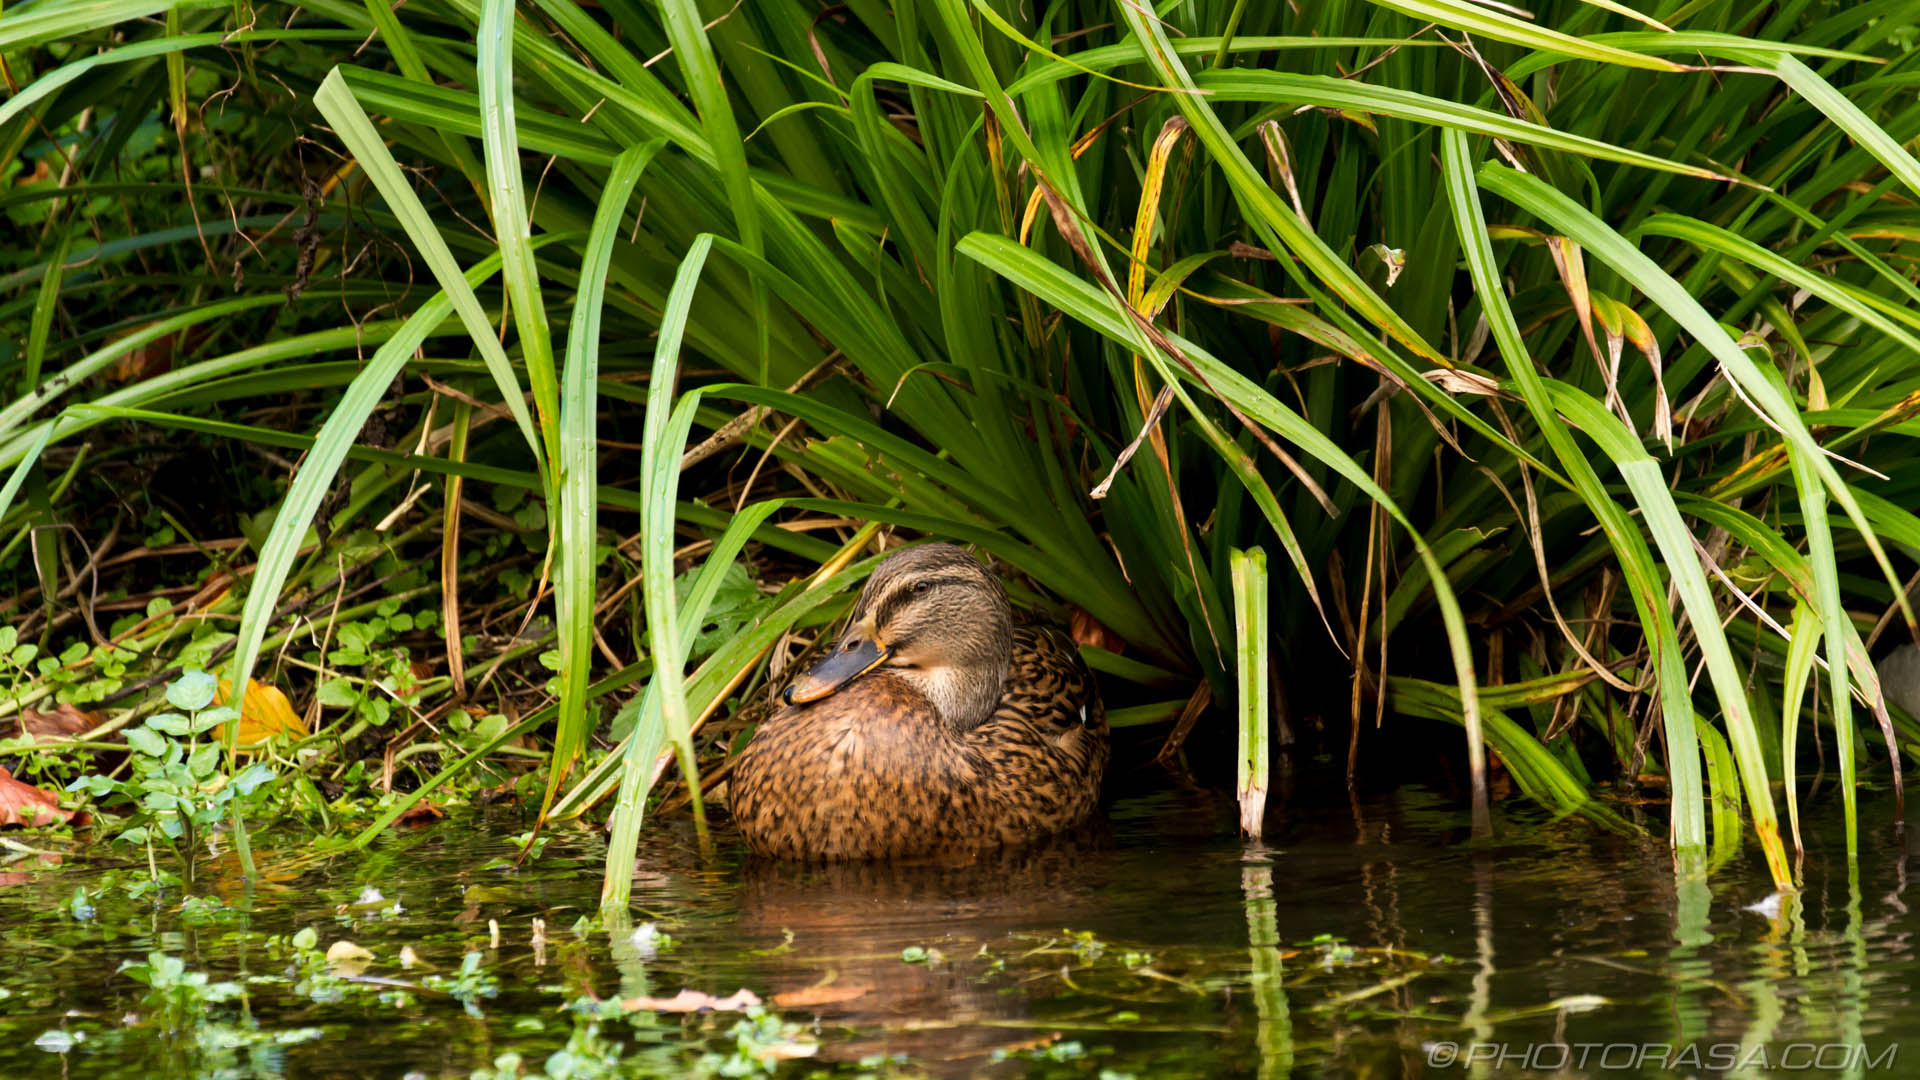 https://photorasa.com/mallard-ducks/wild-duck-in-the-greenery/